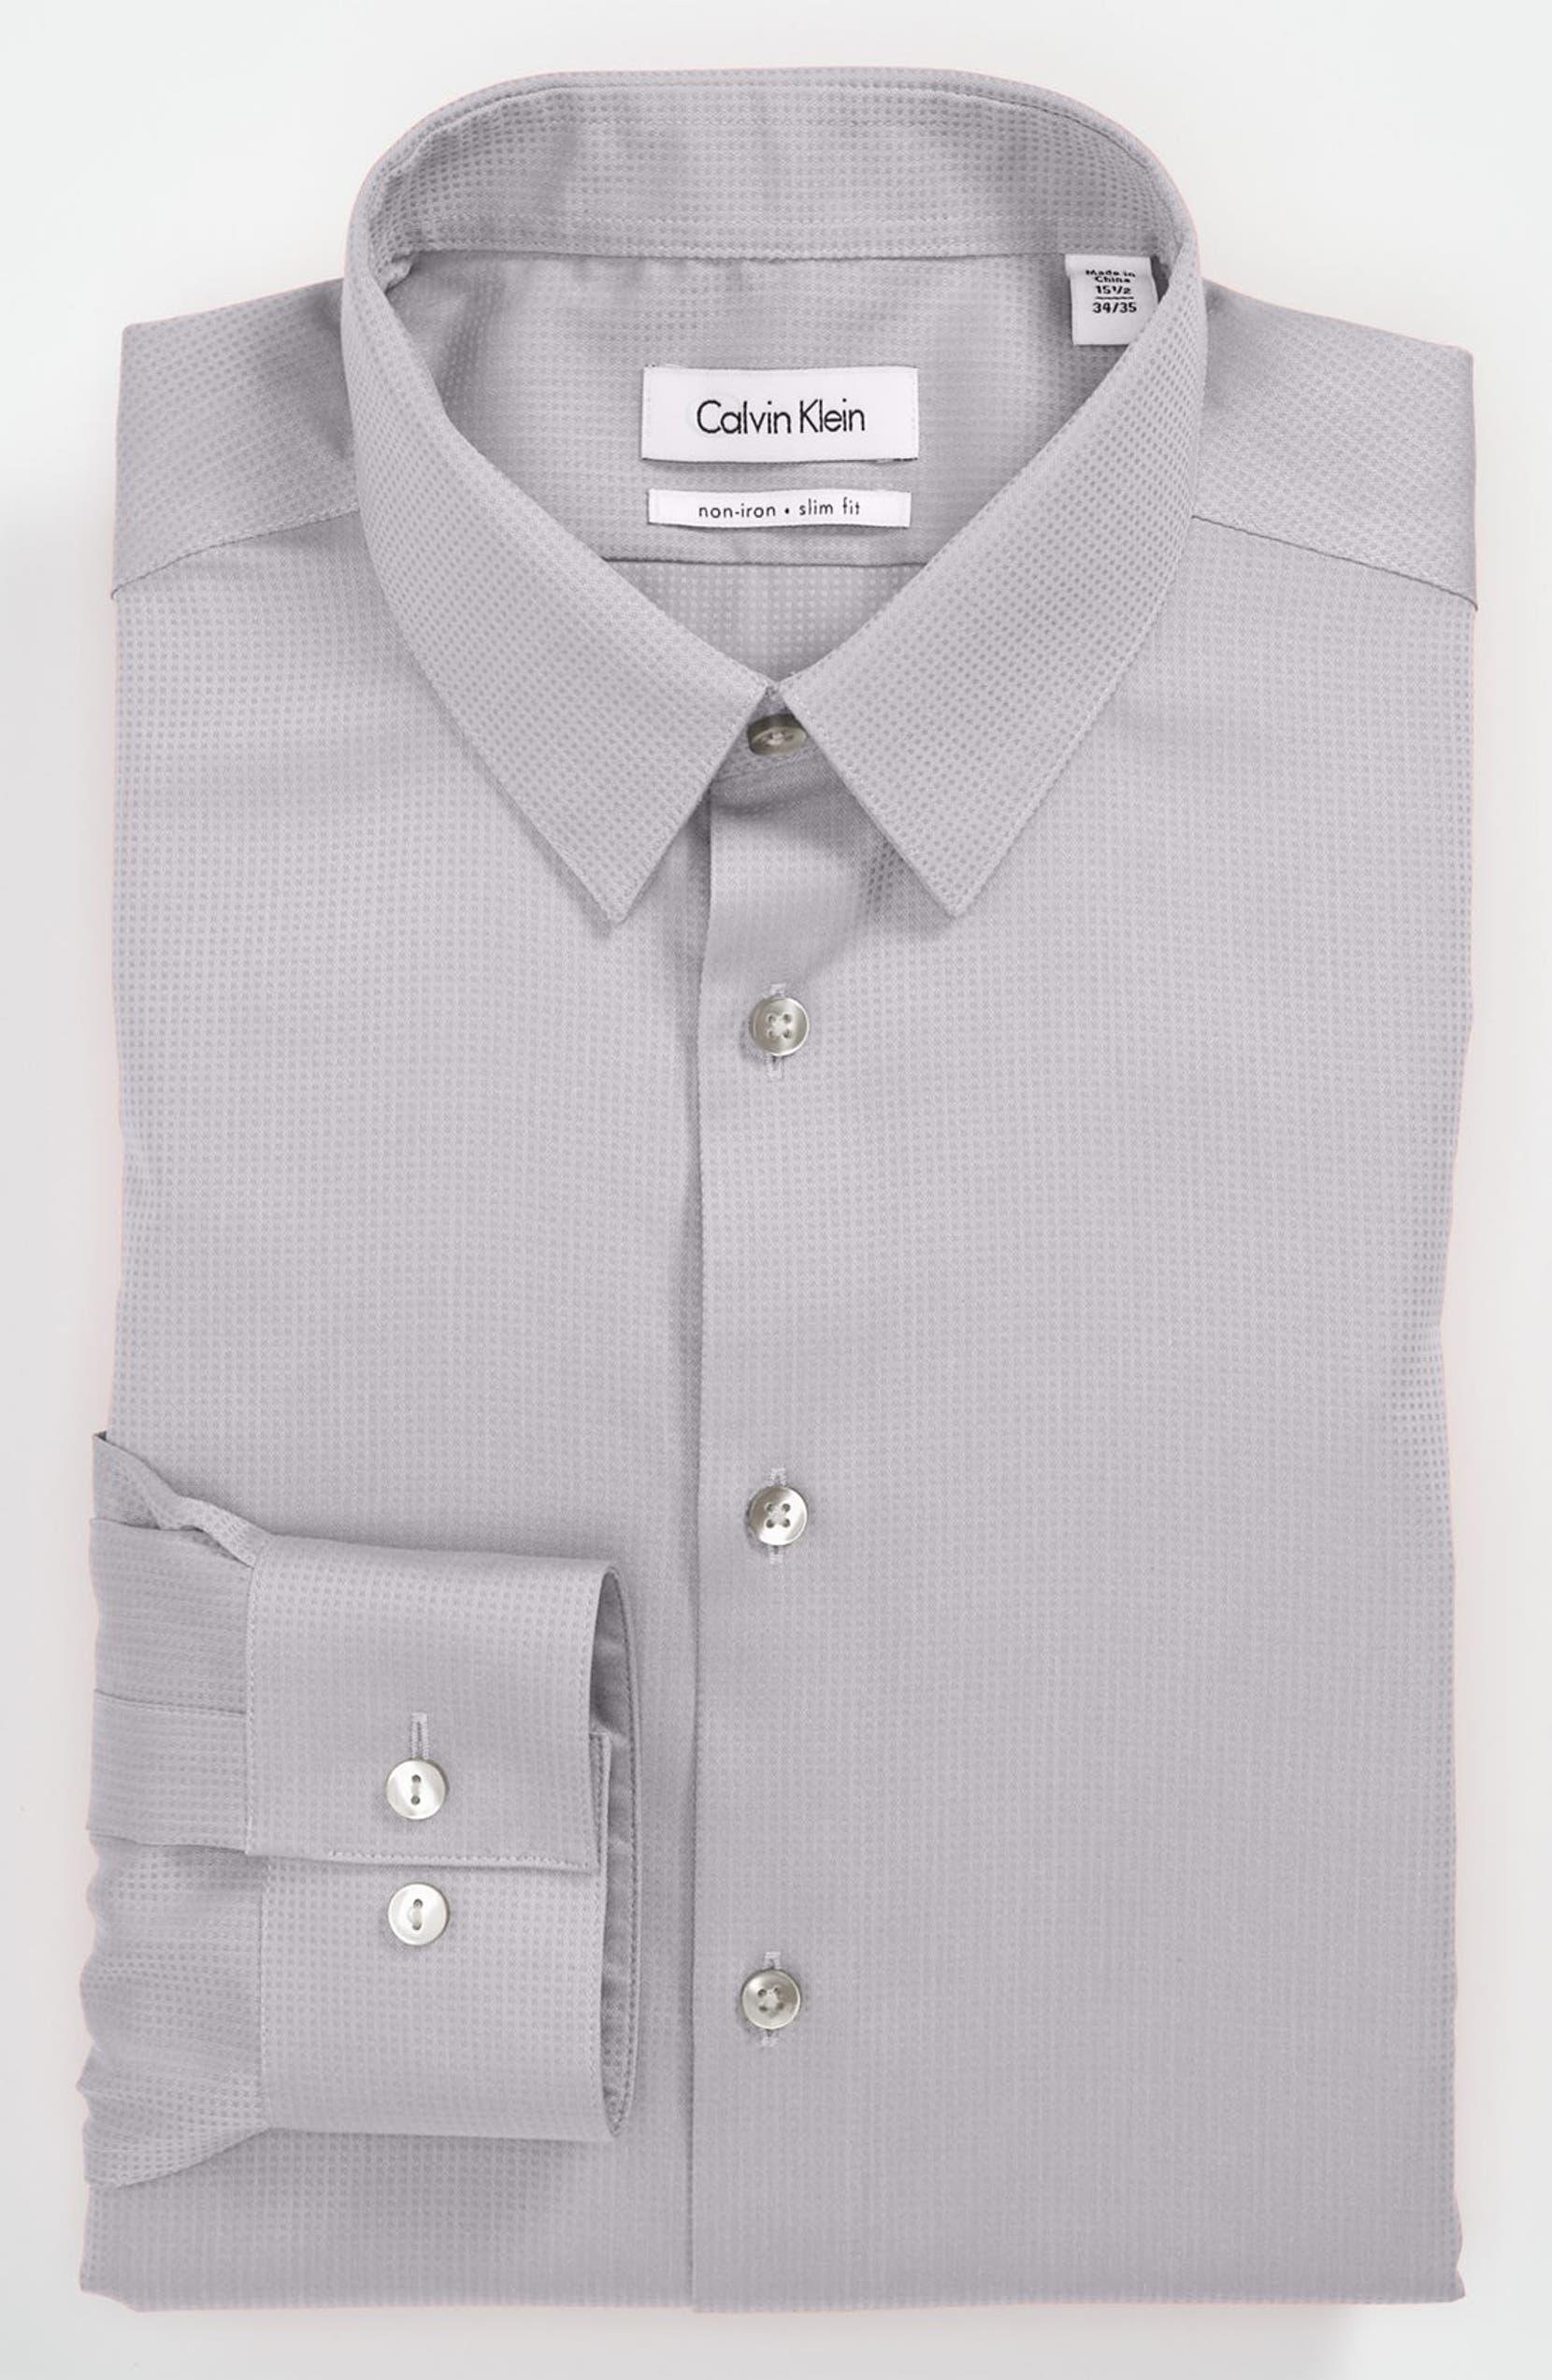 Calvin Klein Miami Check Slim Fit Non Iron Dress Shirt Nordstrom